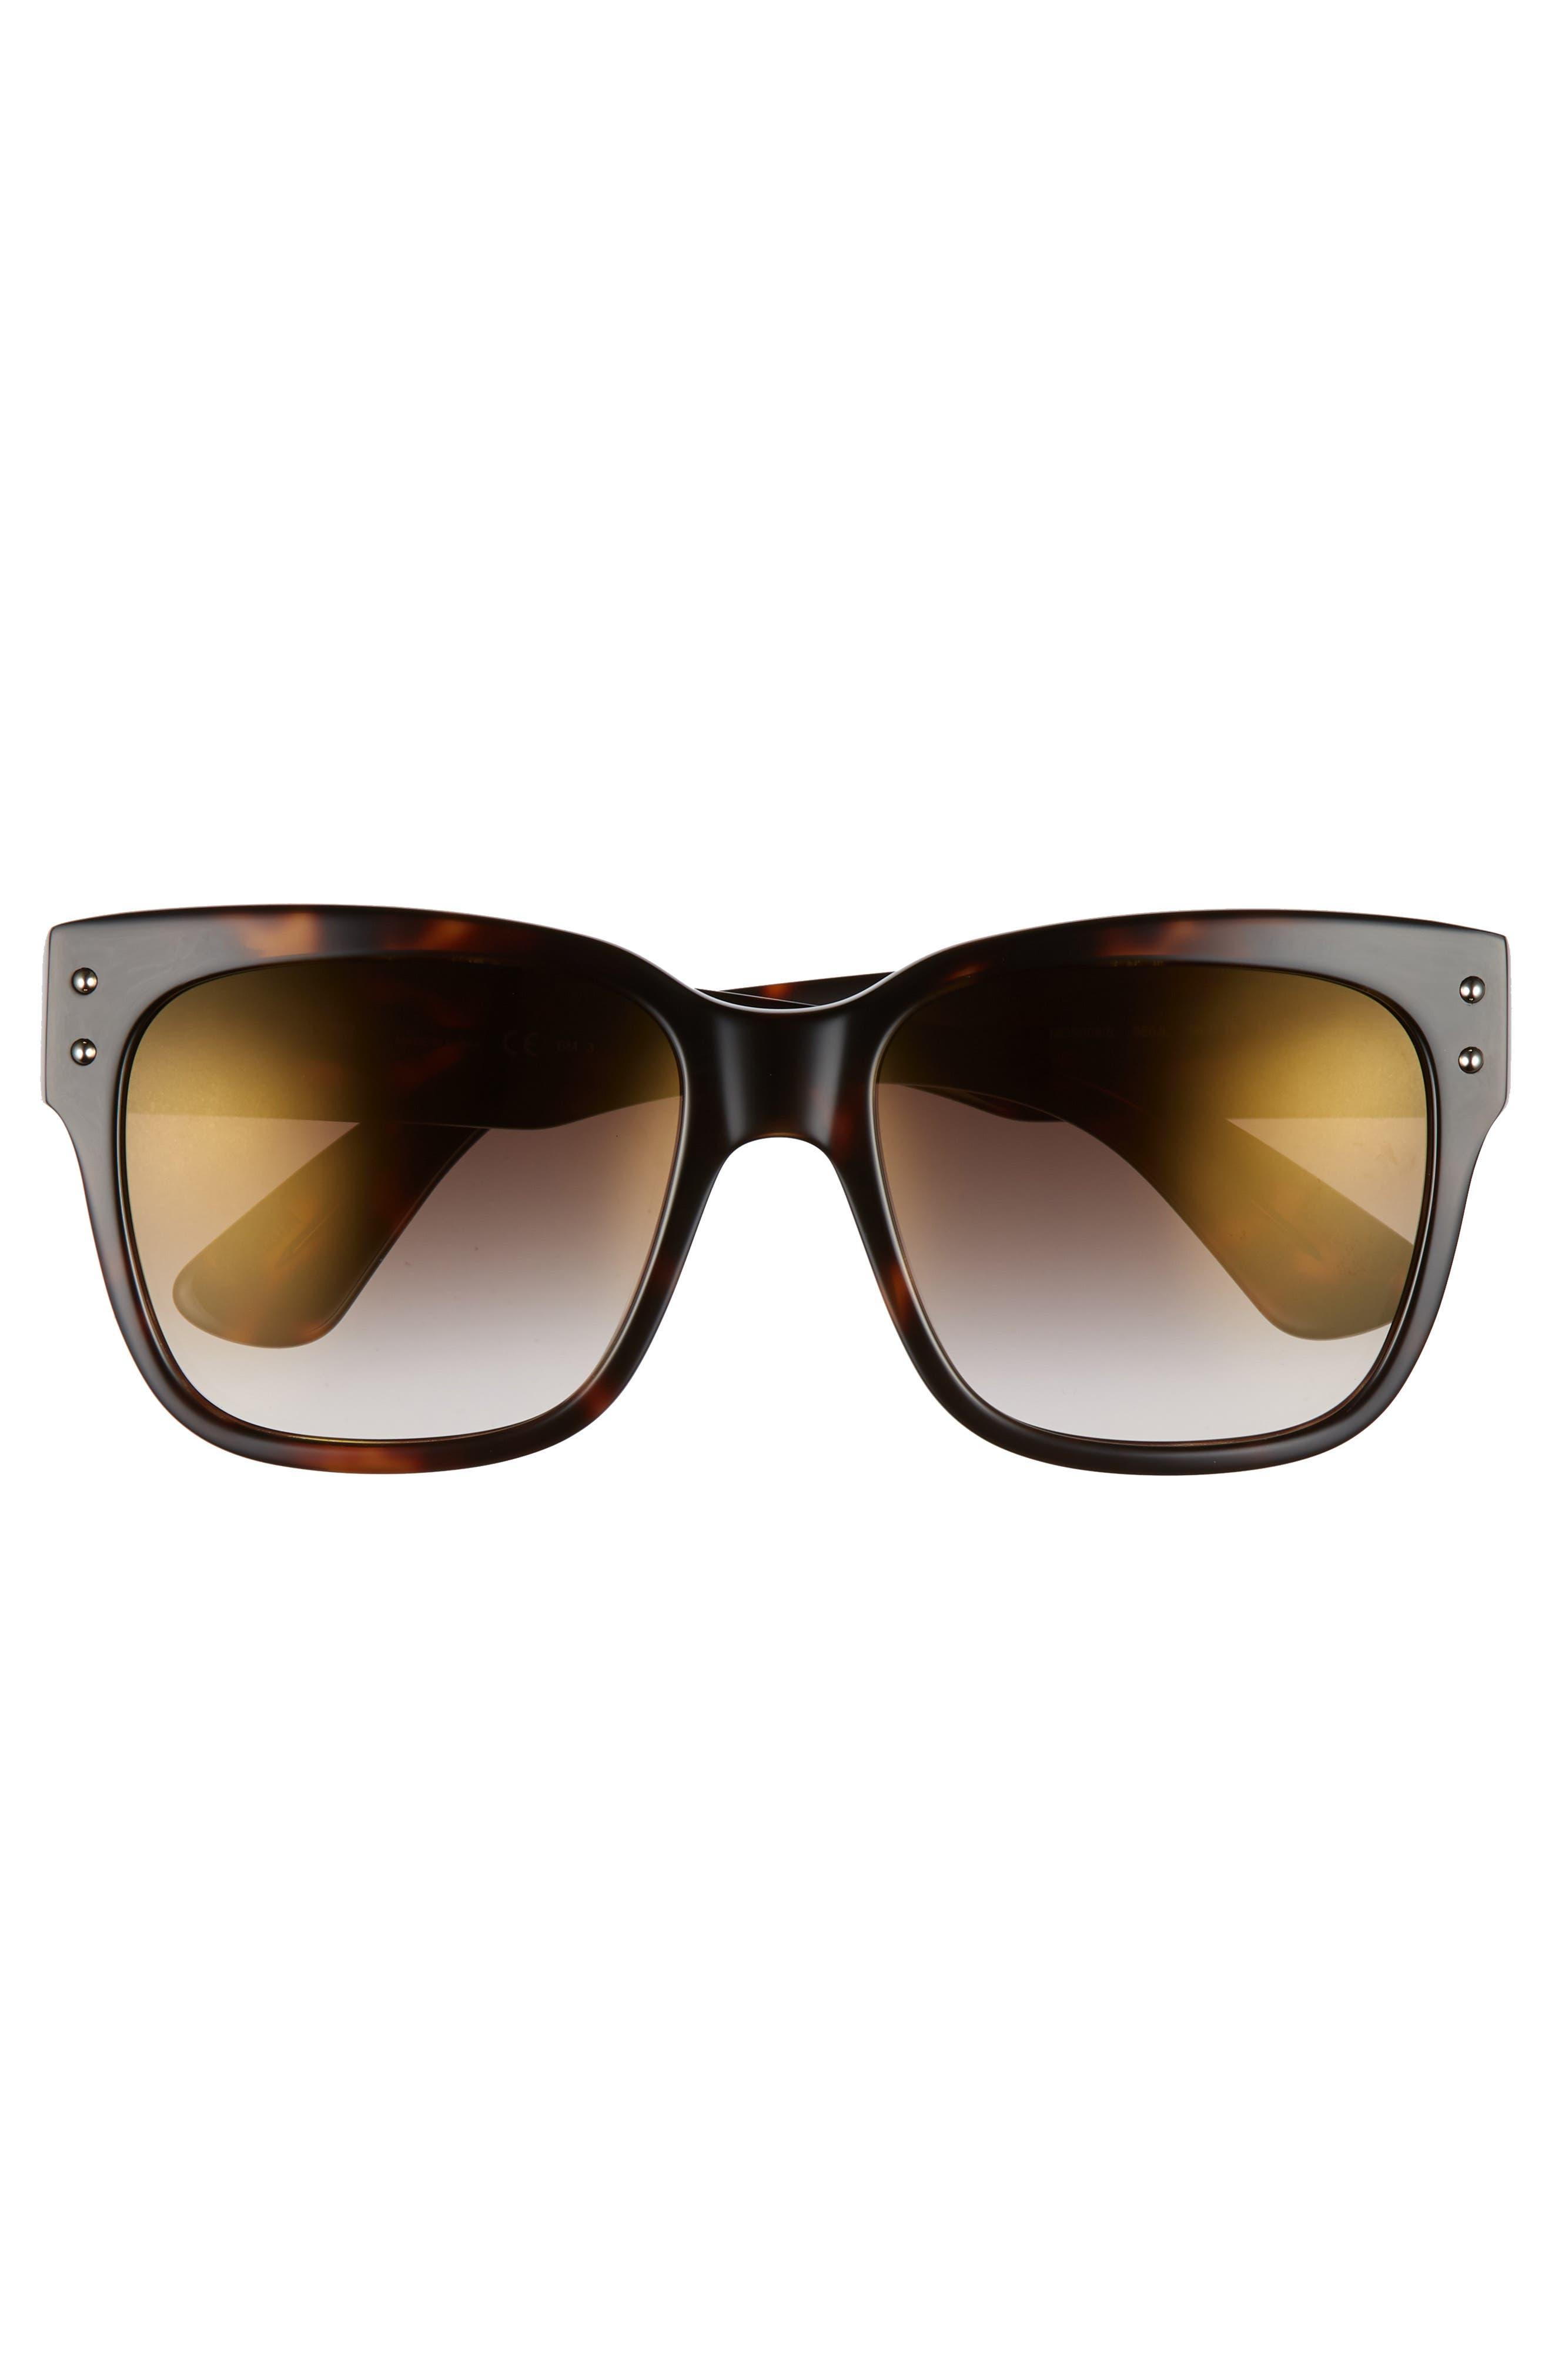 56mm Gradient Lens Sunglasses,                             Alternate thumbnail 3, color,                             Dark Havana